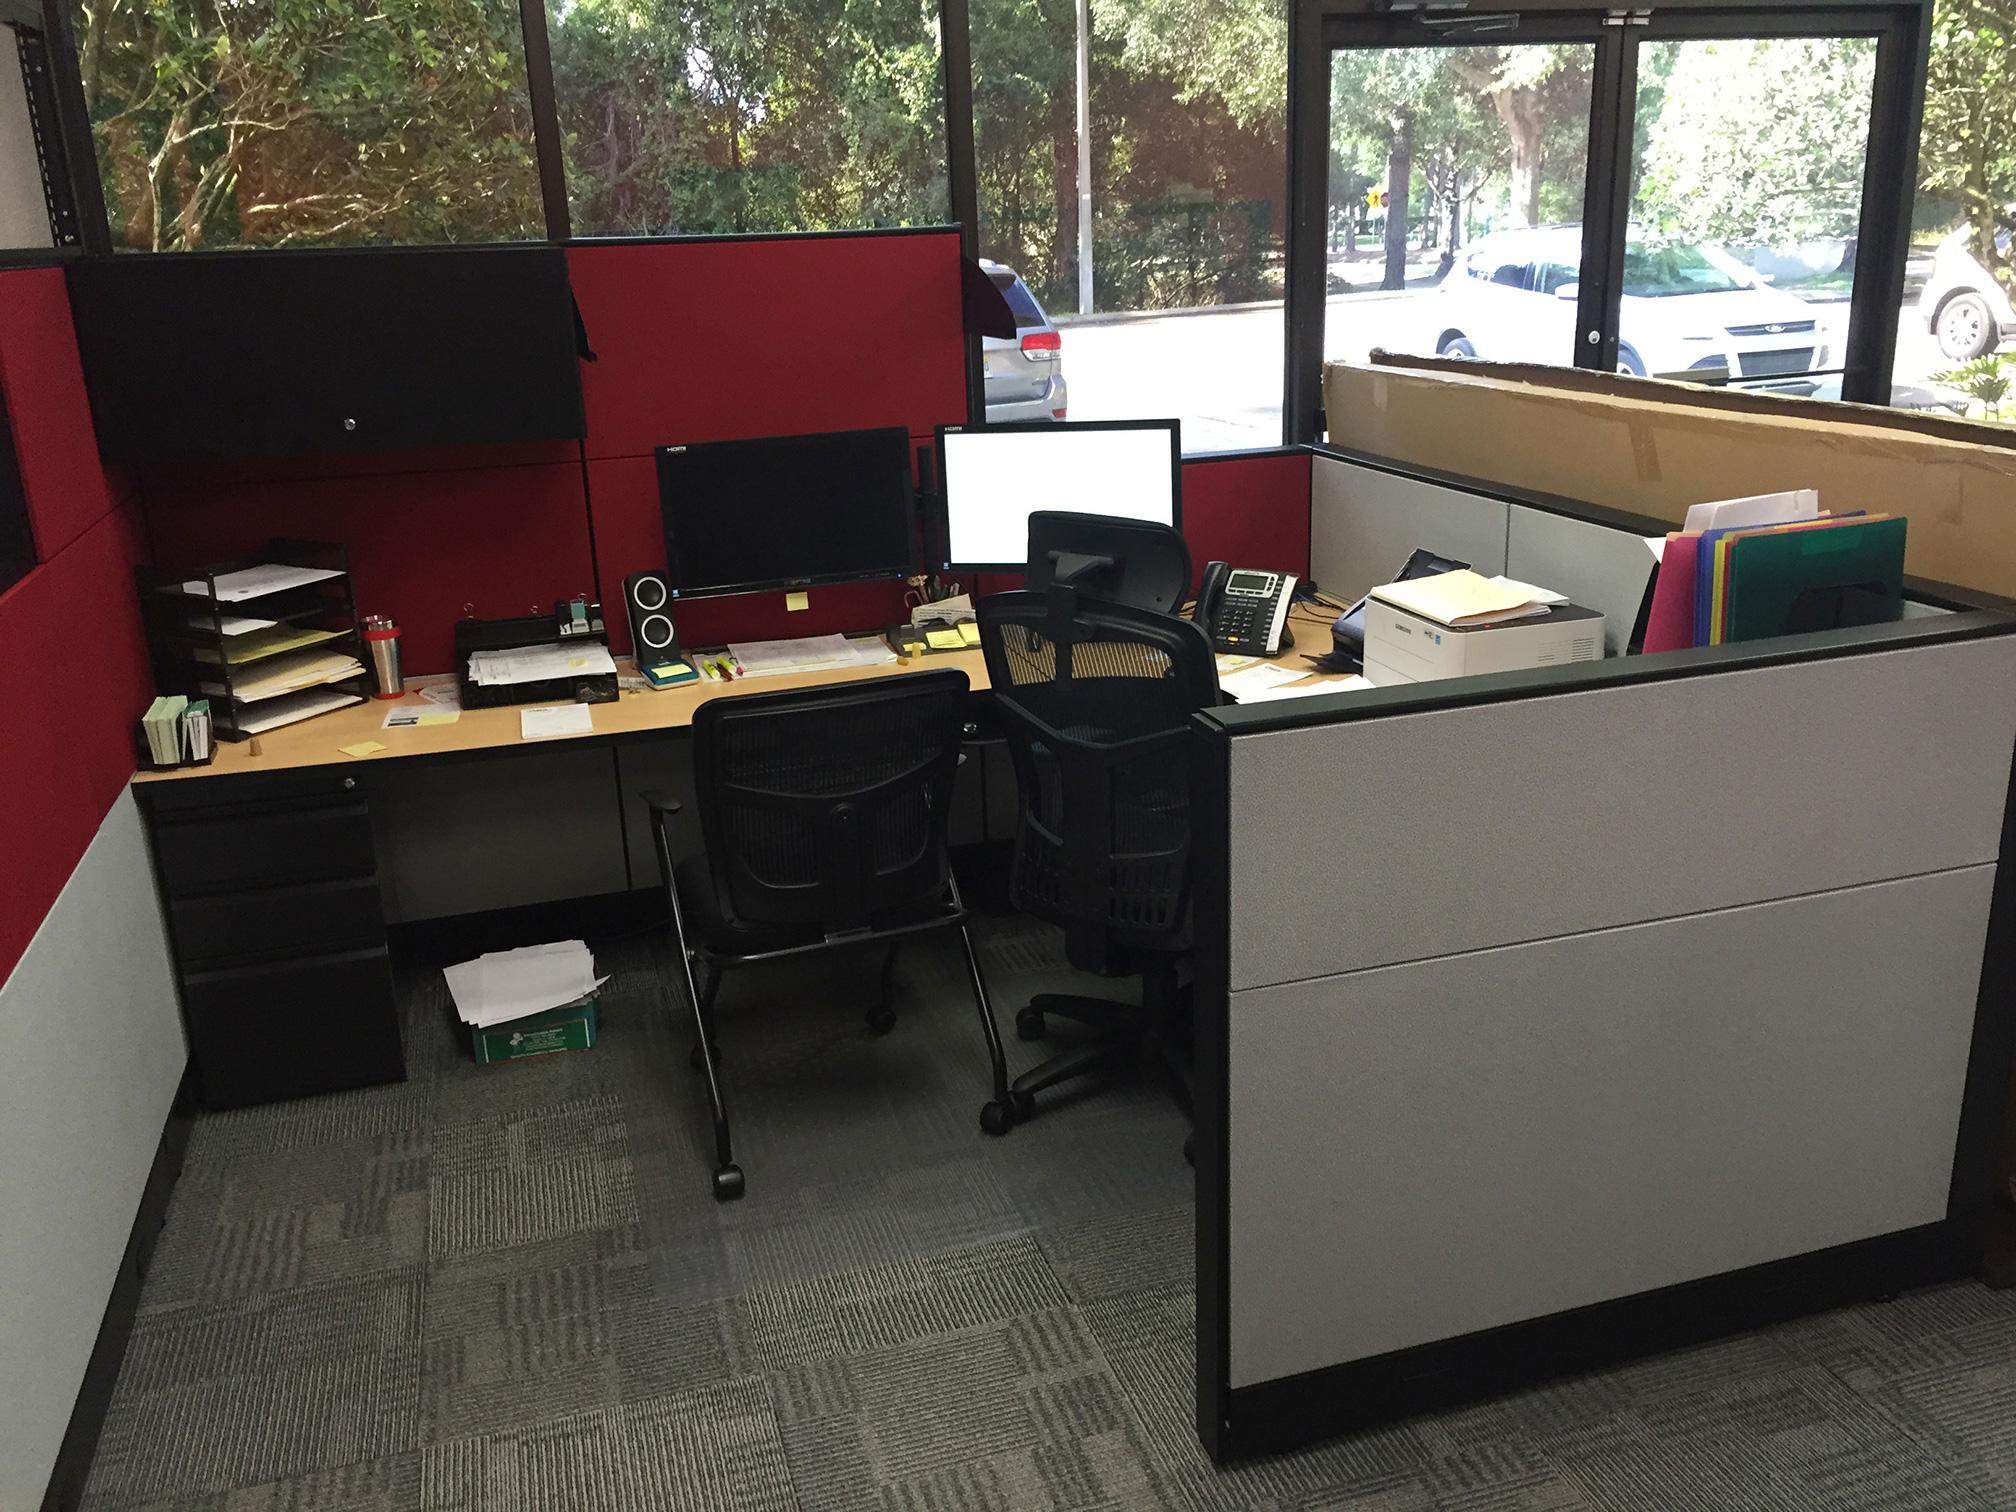 office-cubicles-for-sale-in-seaside-florida-2.jpg